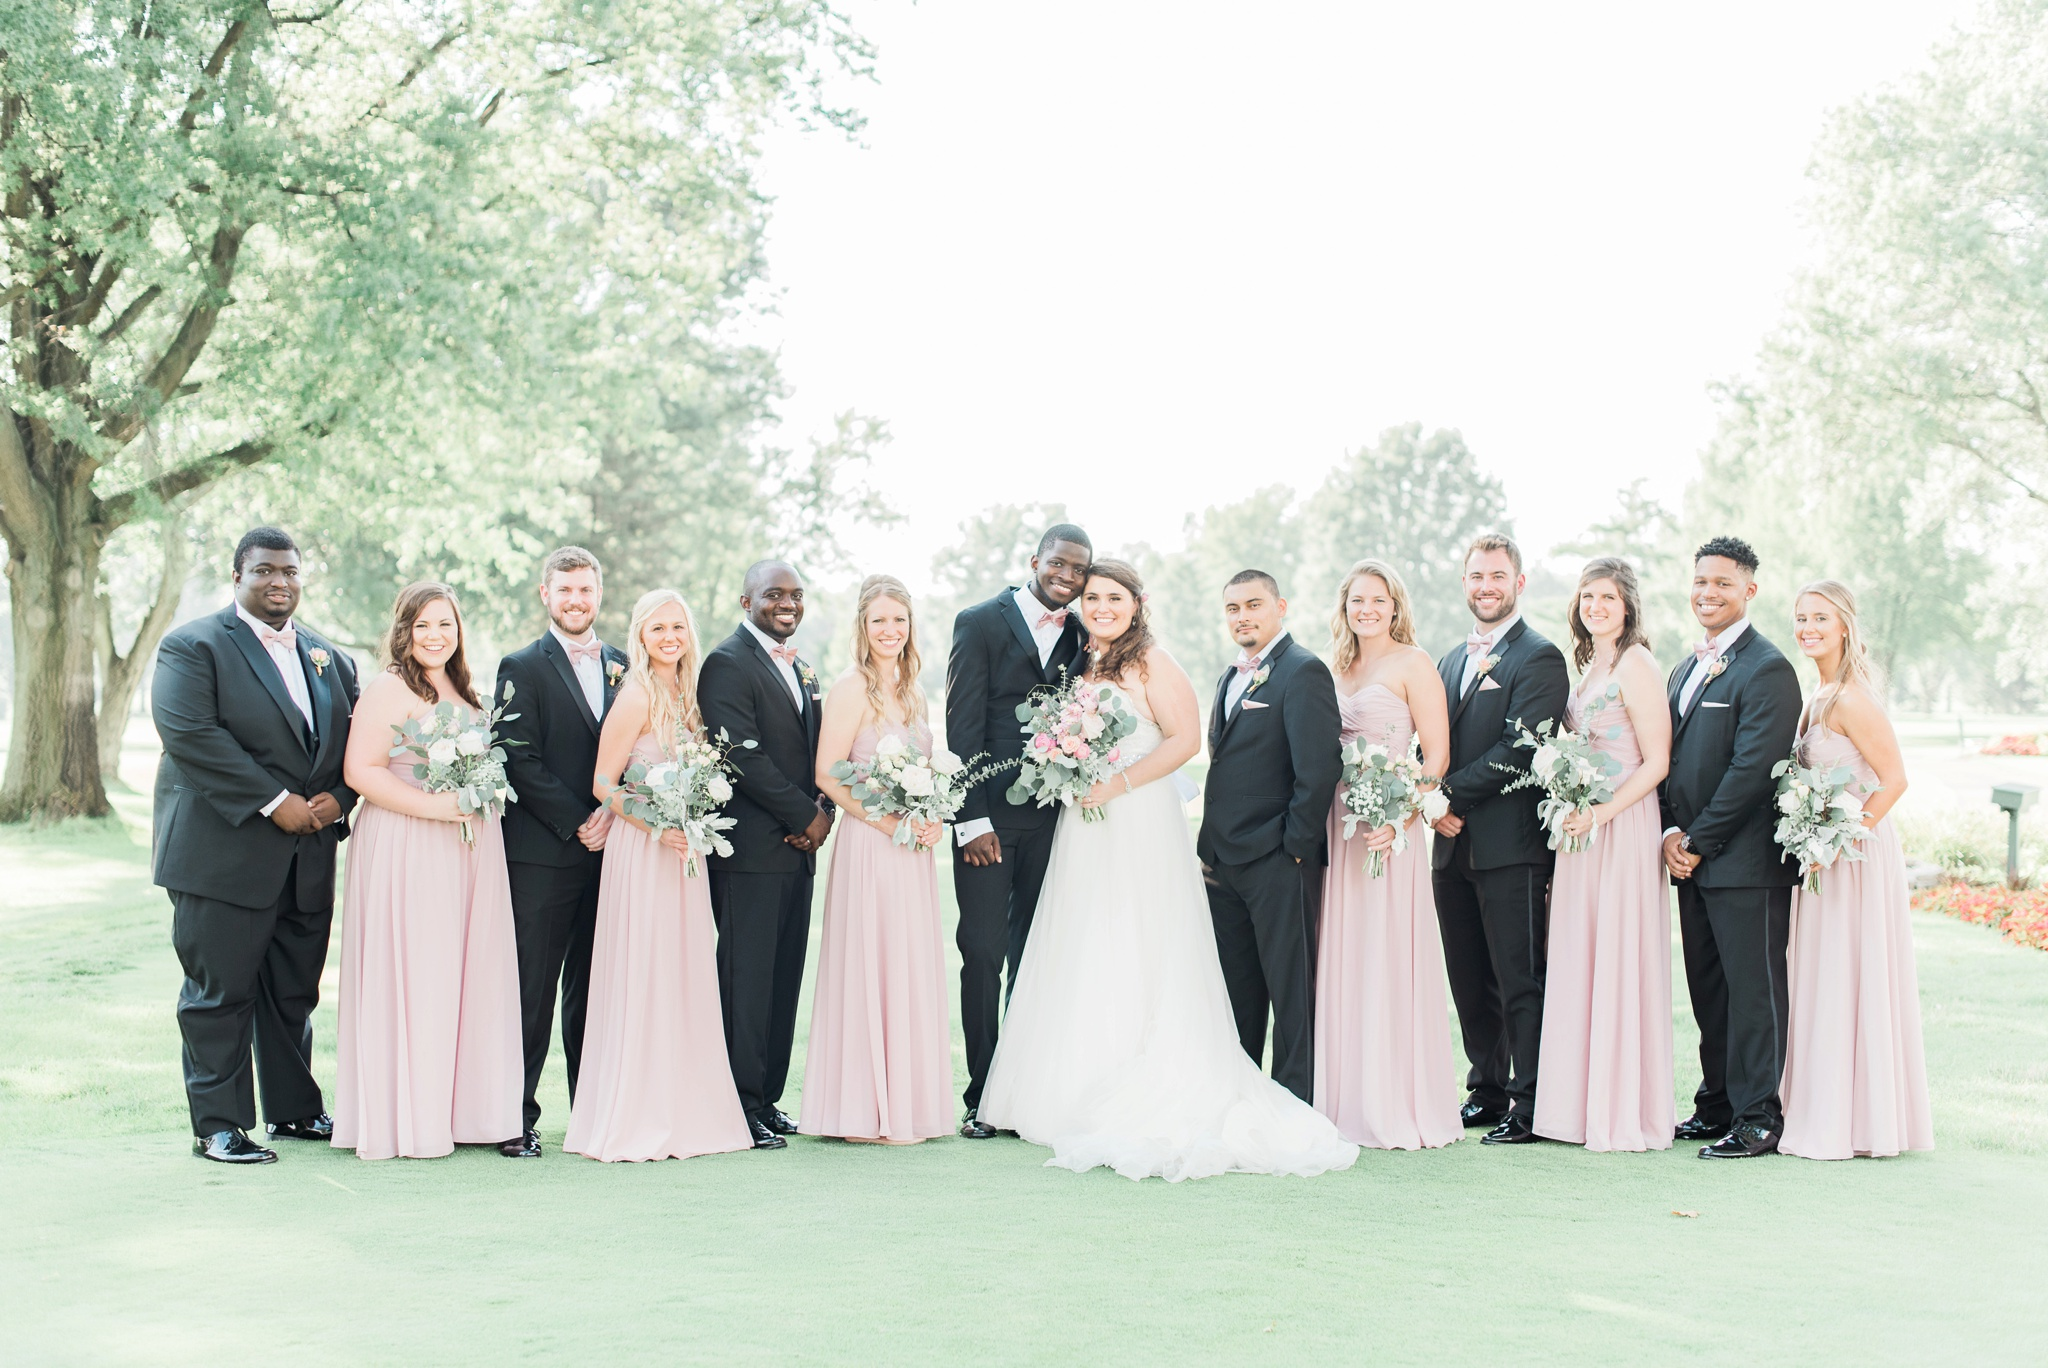 worthington-hills-country-club-wedding-columbus-ohio-meg-evan_0066.jpg